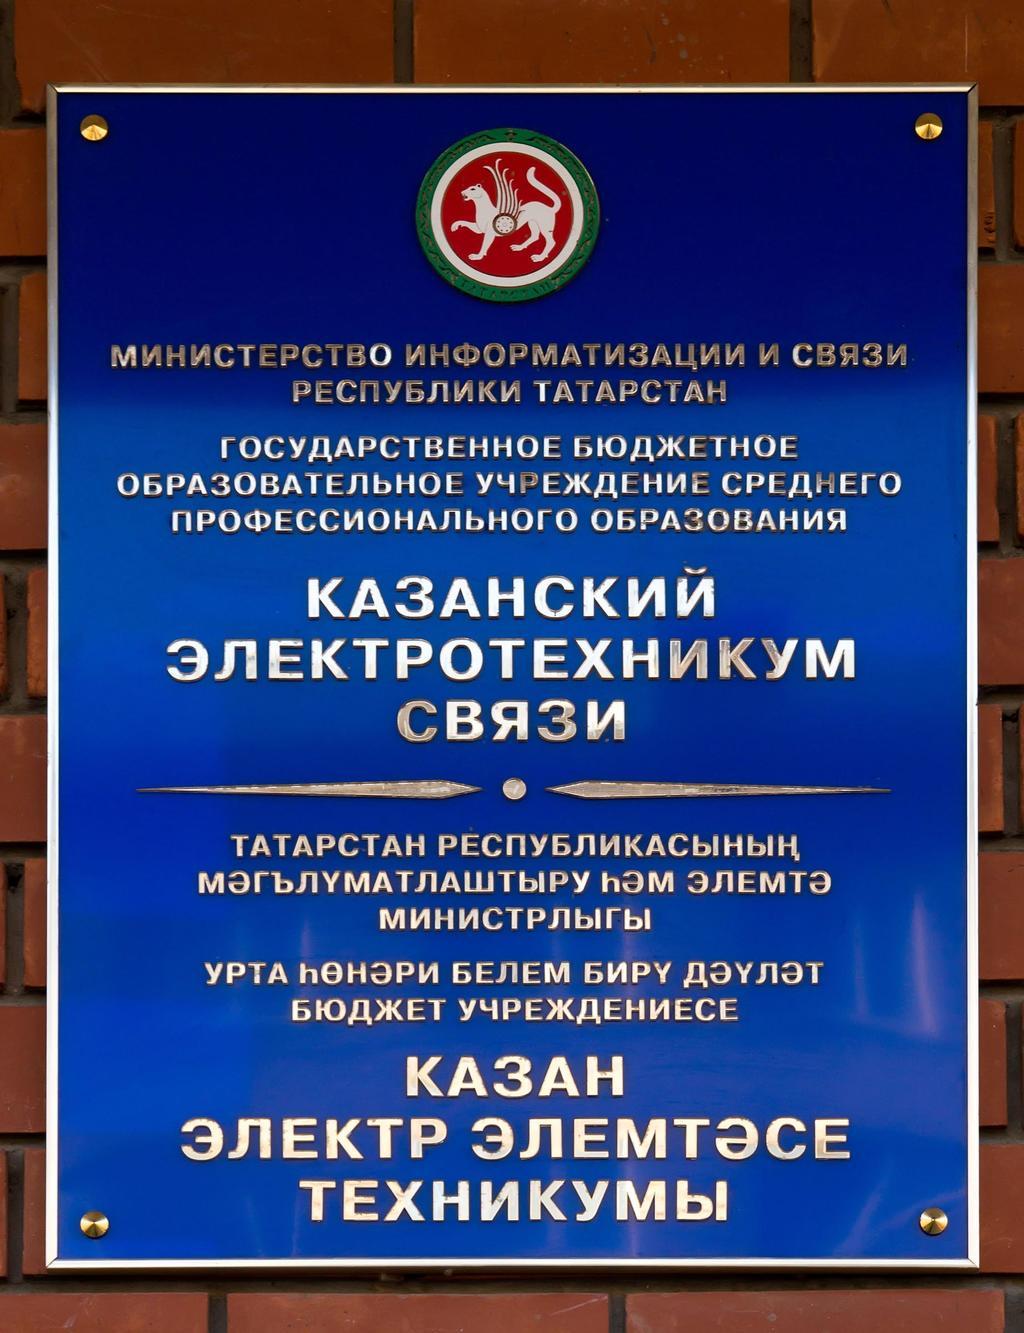 Информационная табличка на здании Казанского электротехникума связи. 2014 ©Tatfrontu.ru Photo Archive